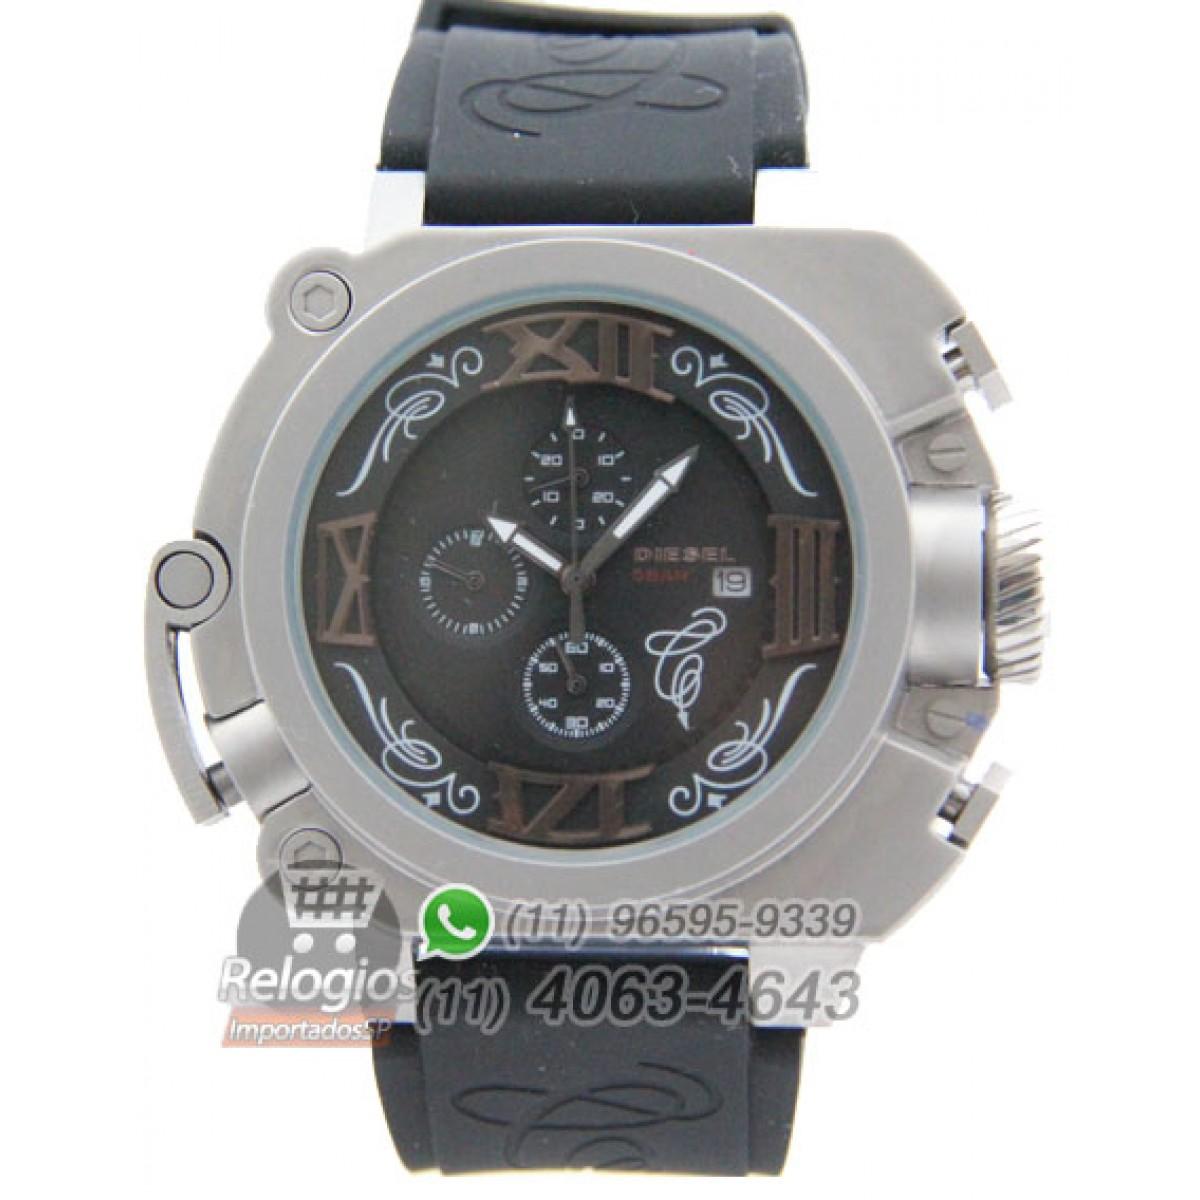 7b995436f50 Relógio Réplica Diesel Batman Prata Preto ( PROMOÇÃO )